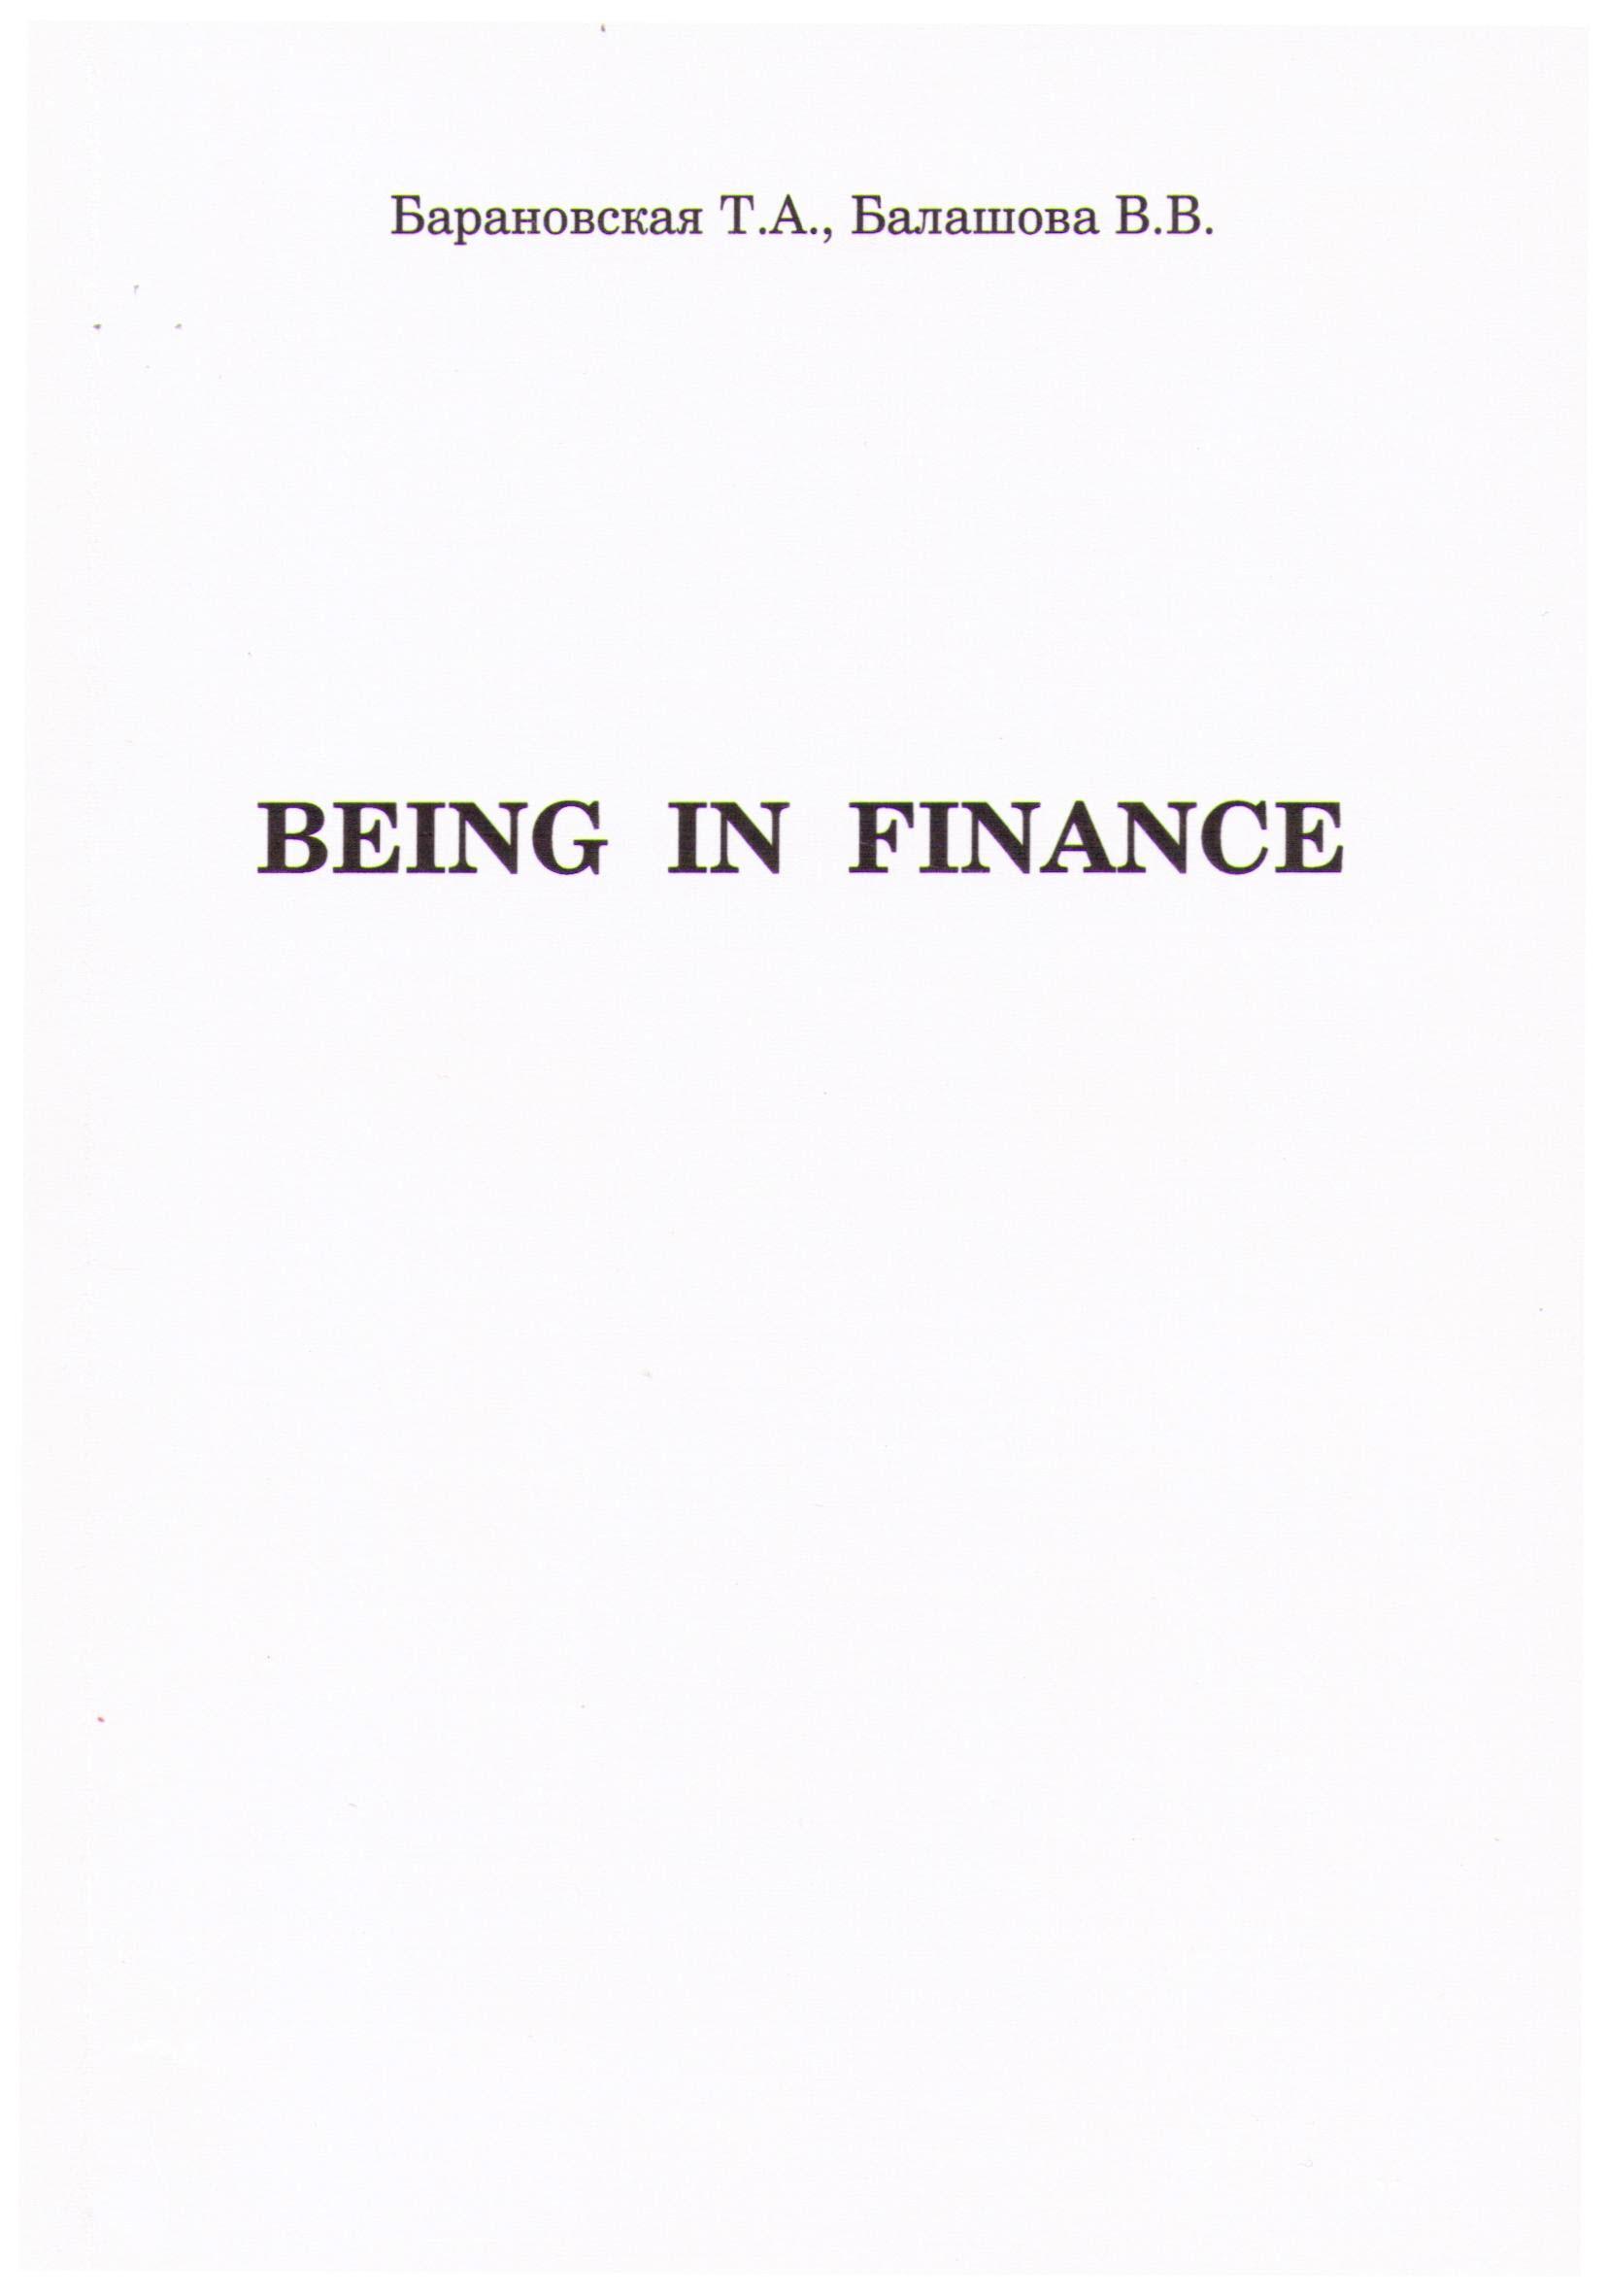 Being in Finance